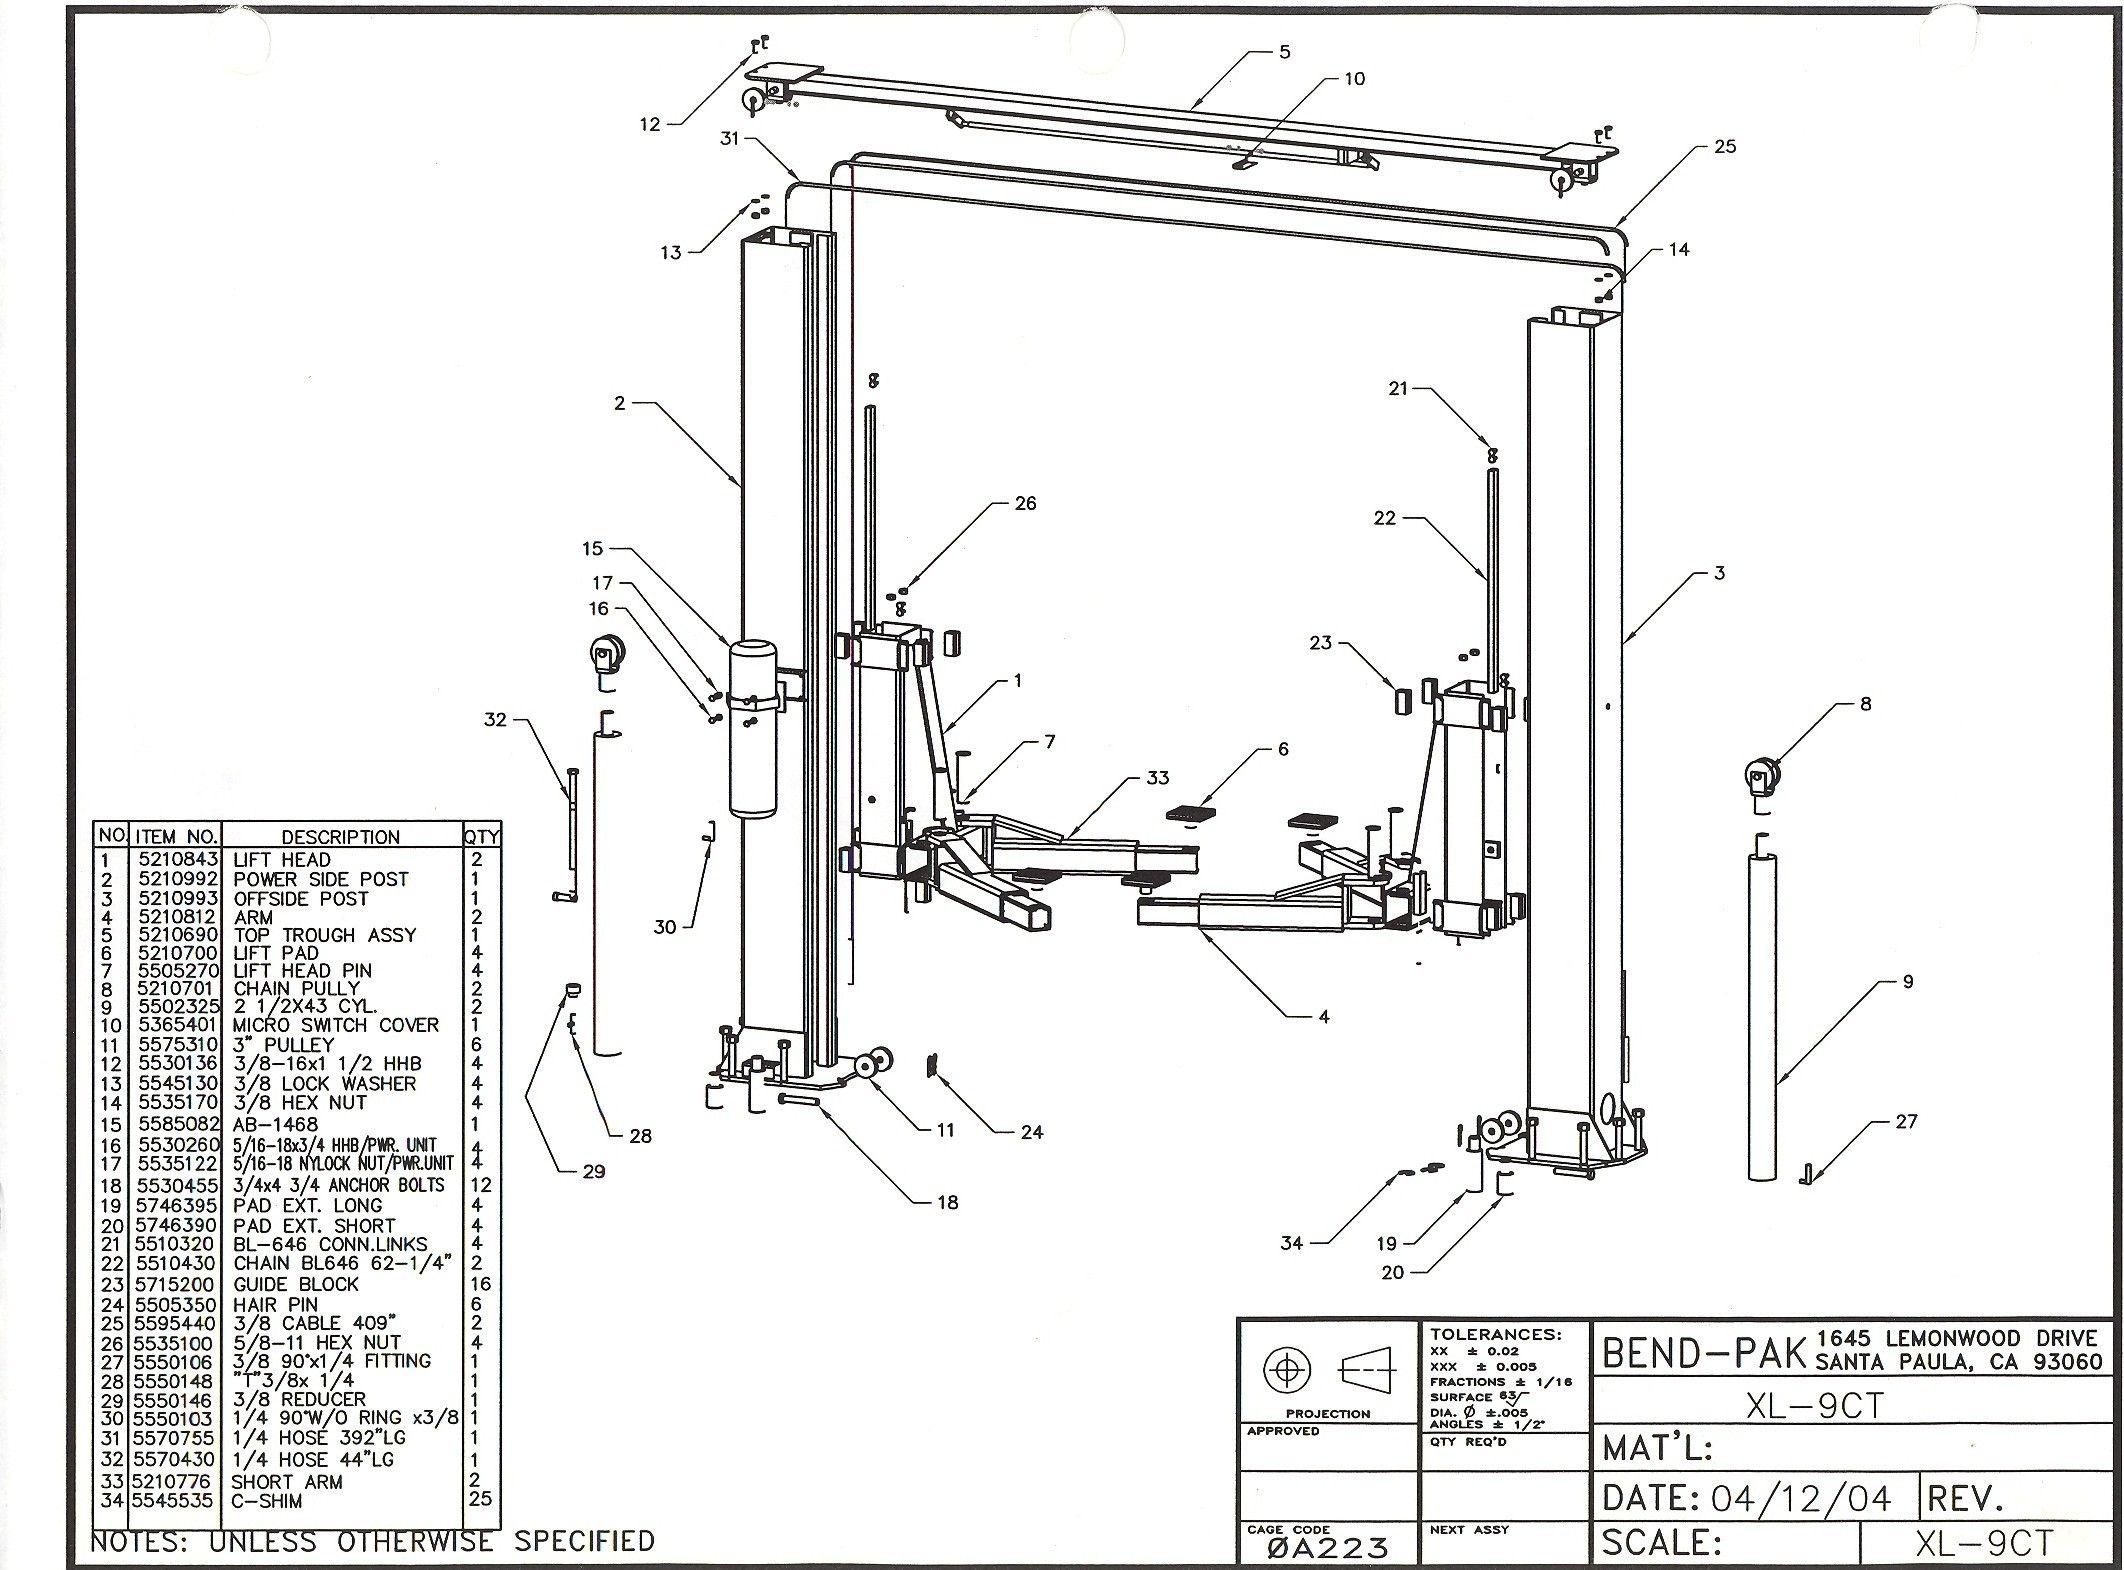 Wiring Diagram For Auto Lift Con Imagenes